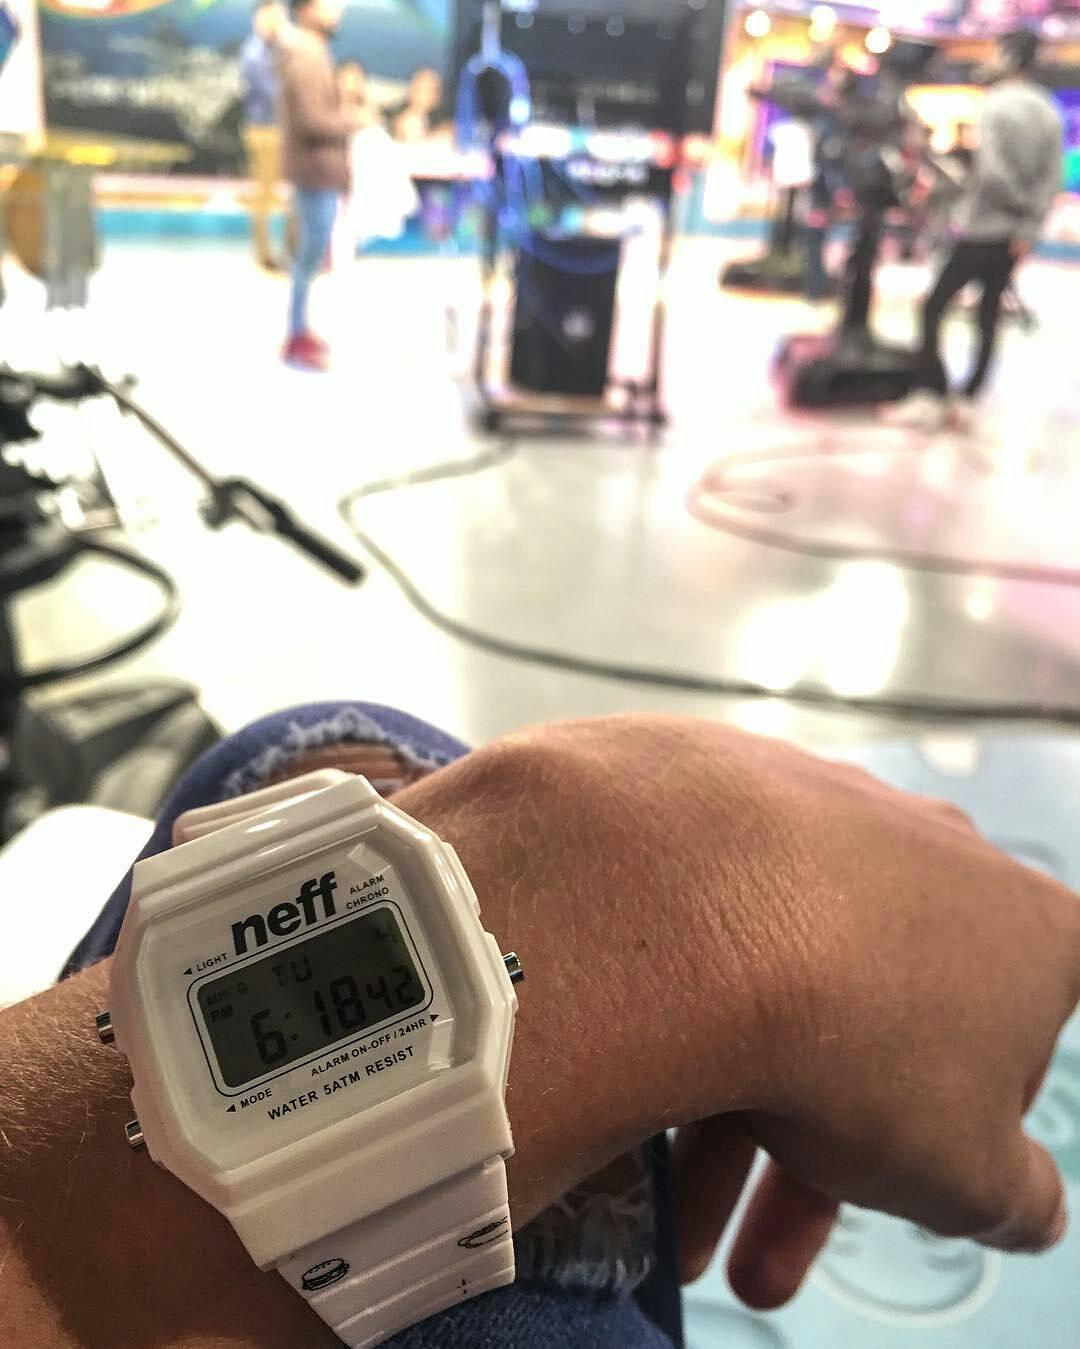 @lelumendy con su reloj @neffargentina. #foreverfun #NeffArgentina #Youreoneofusnow